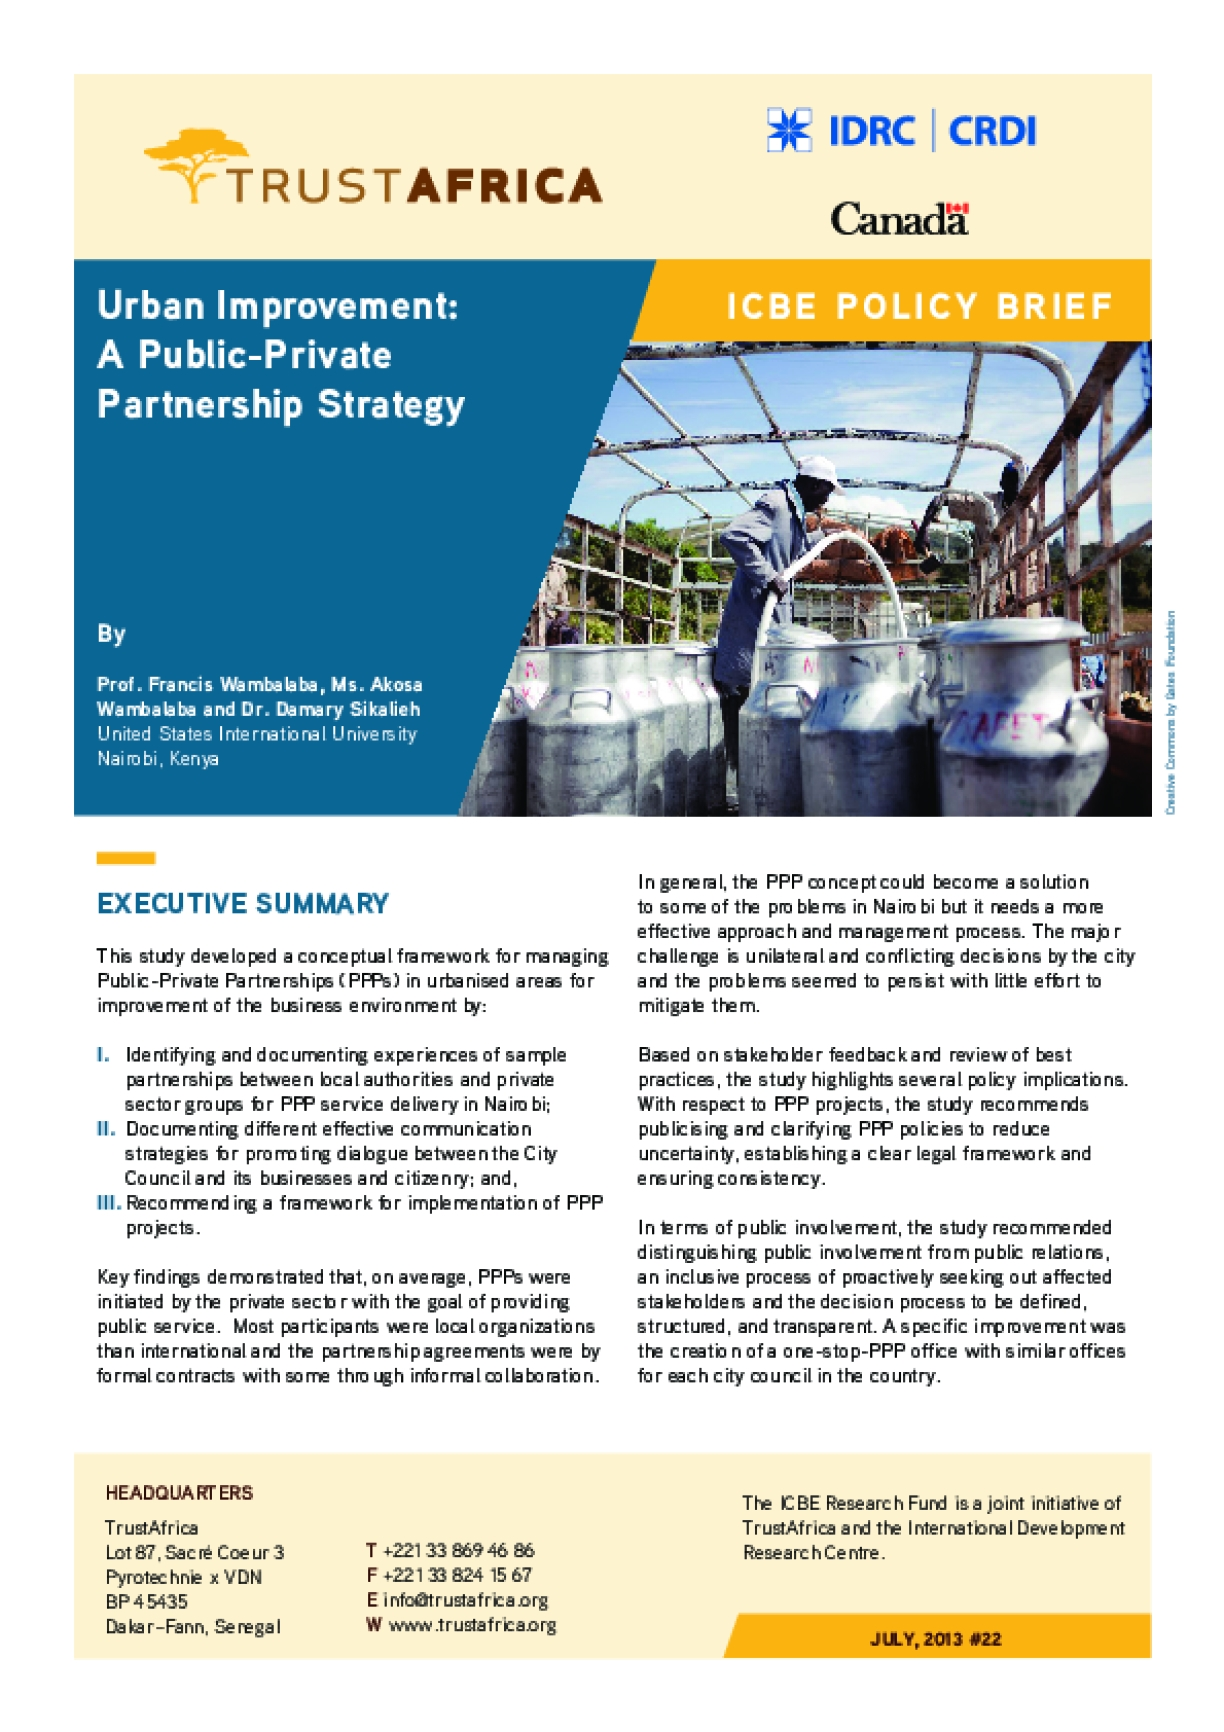 Urban Improvement: A Public-Private Partnership Strategy